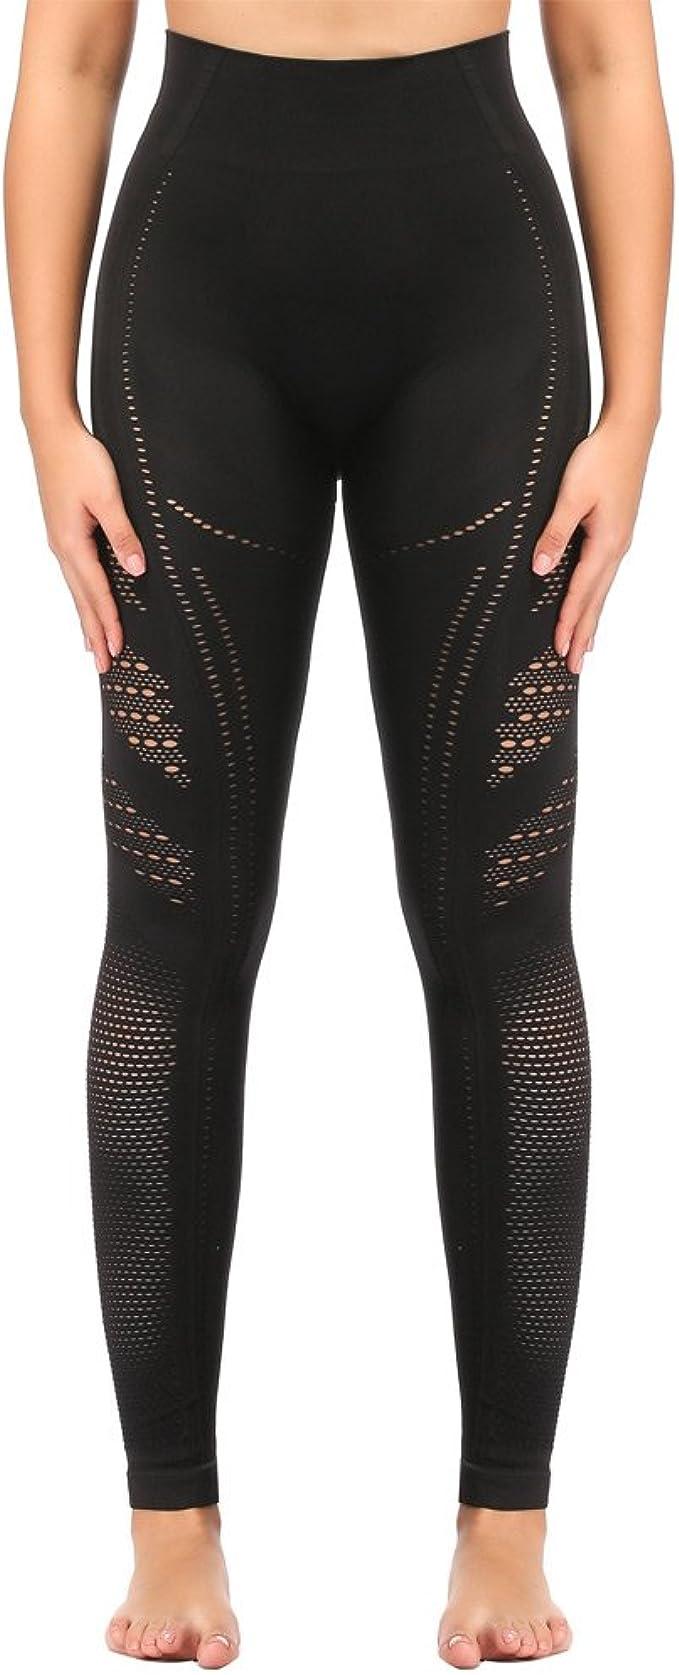 Amazon.com: SEKERMAET Leggings de yoga de cintura alta ...